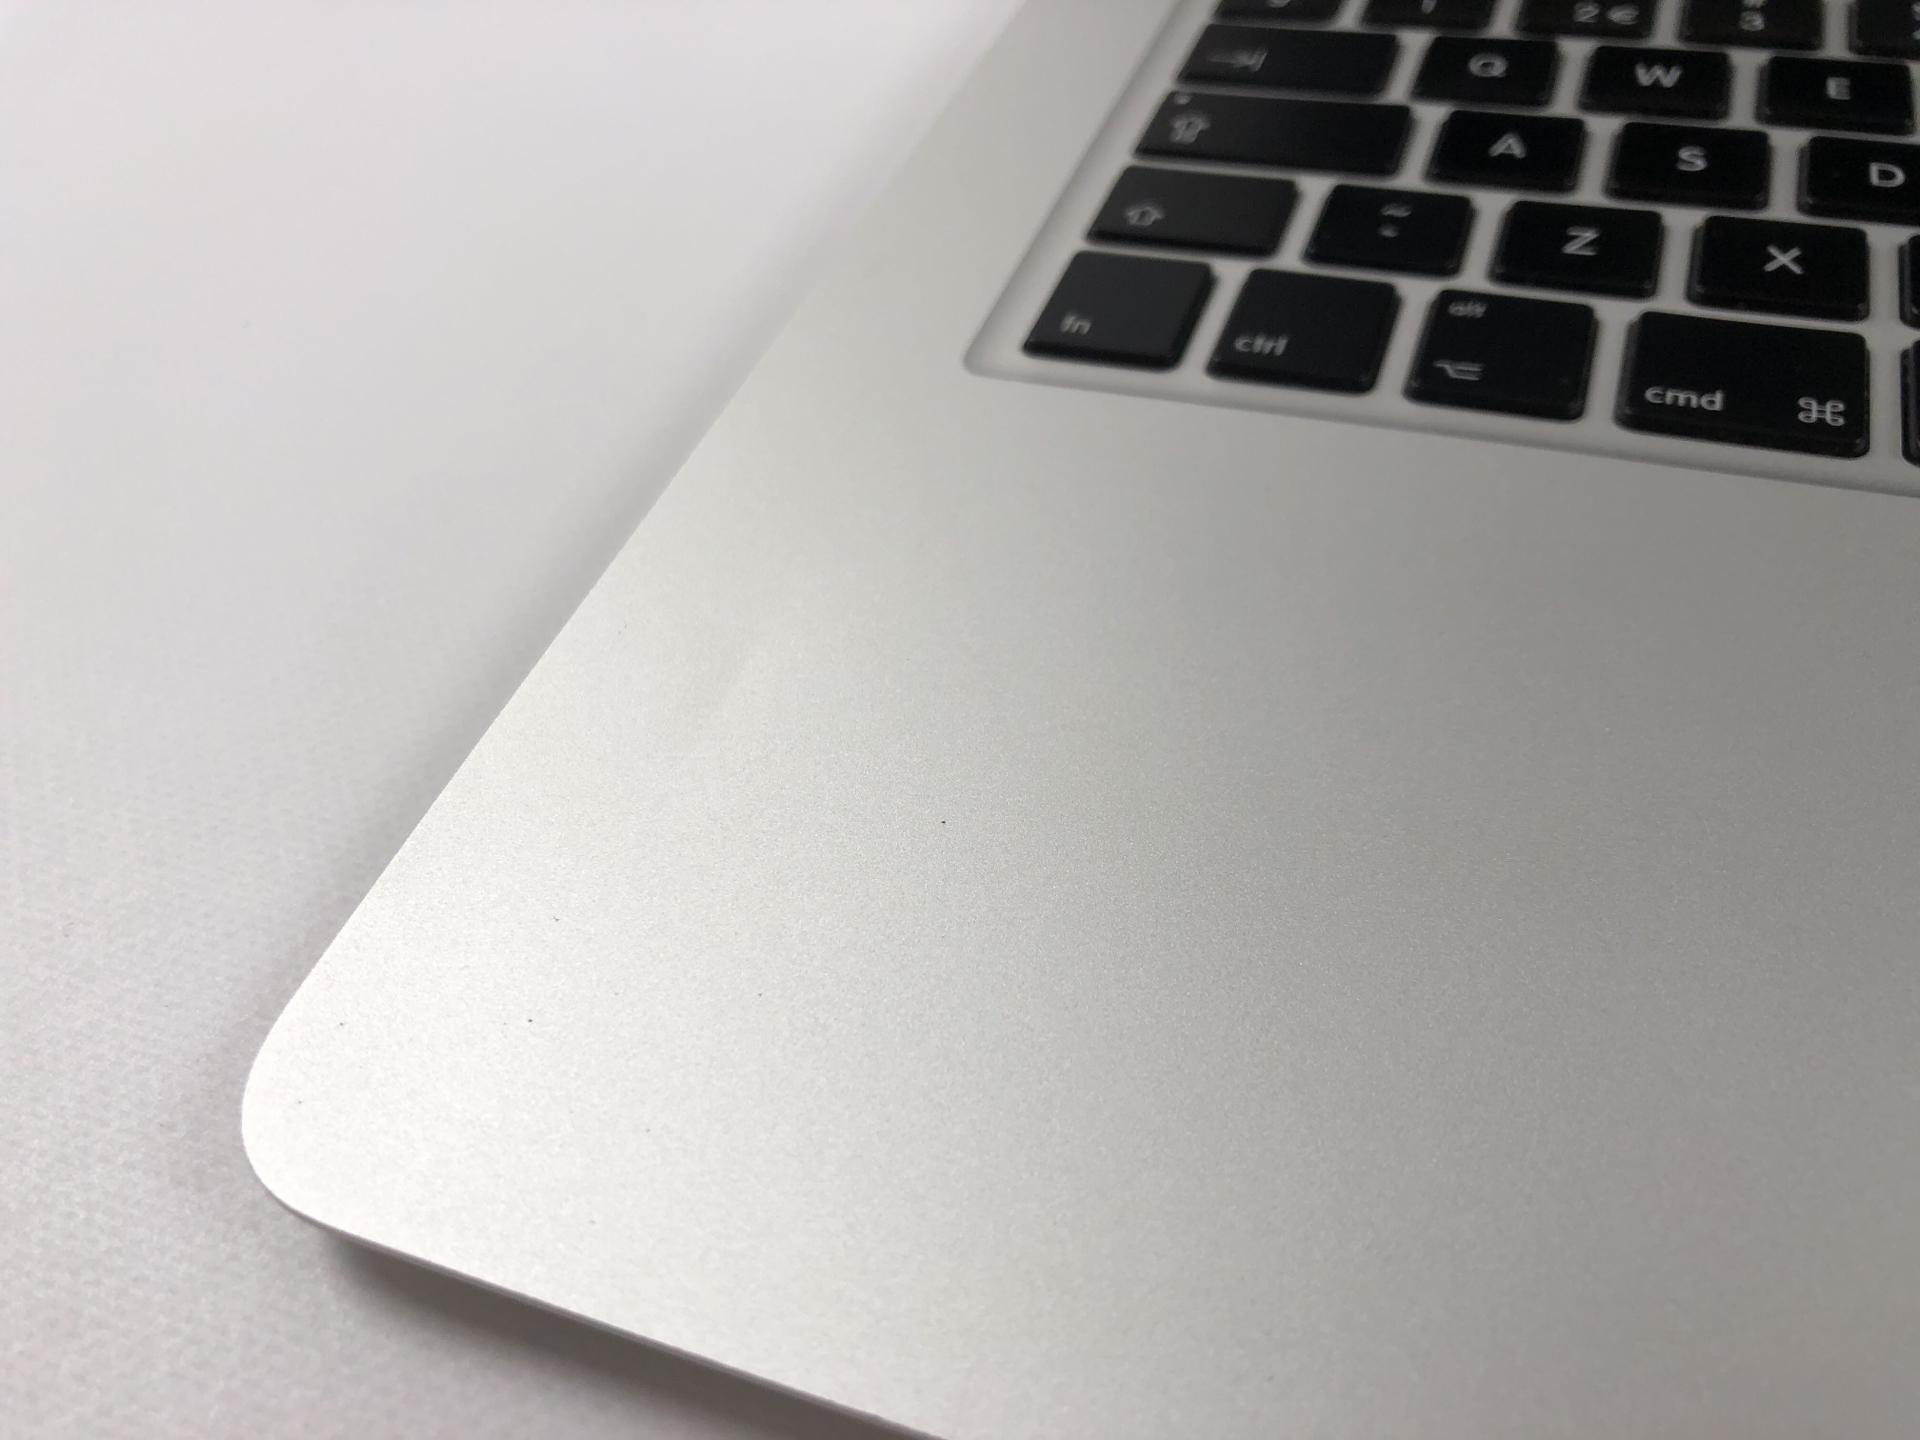 "MacBook Air 13"" Early 2014 (Intel Core i7 1.7 GHz 8 GB RAM 512 GB SSD), Intel Core i7 1.7 GHz, 8 GB RAM, 512 GB SSD, bild 3"